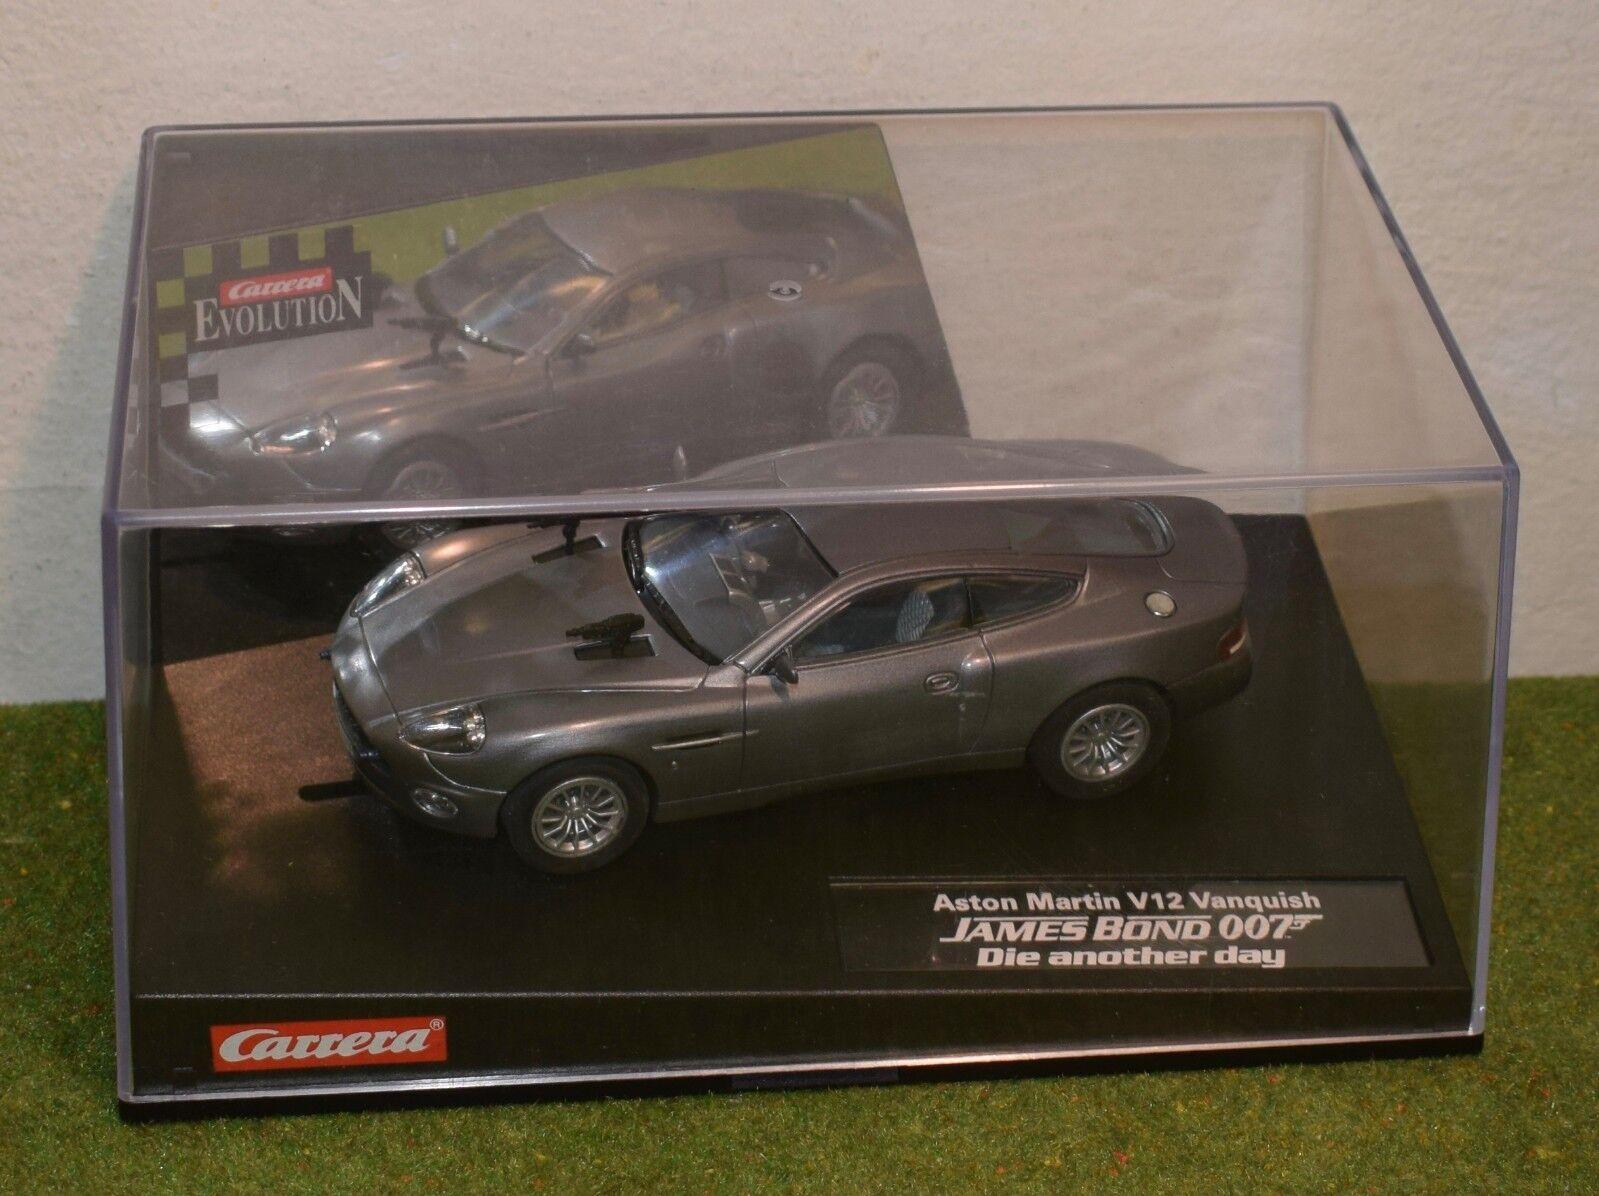 Carrera Evolution 25467 Aston Martin Vanquish James Bond 007 Meurs un autre jour